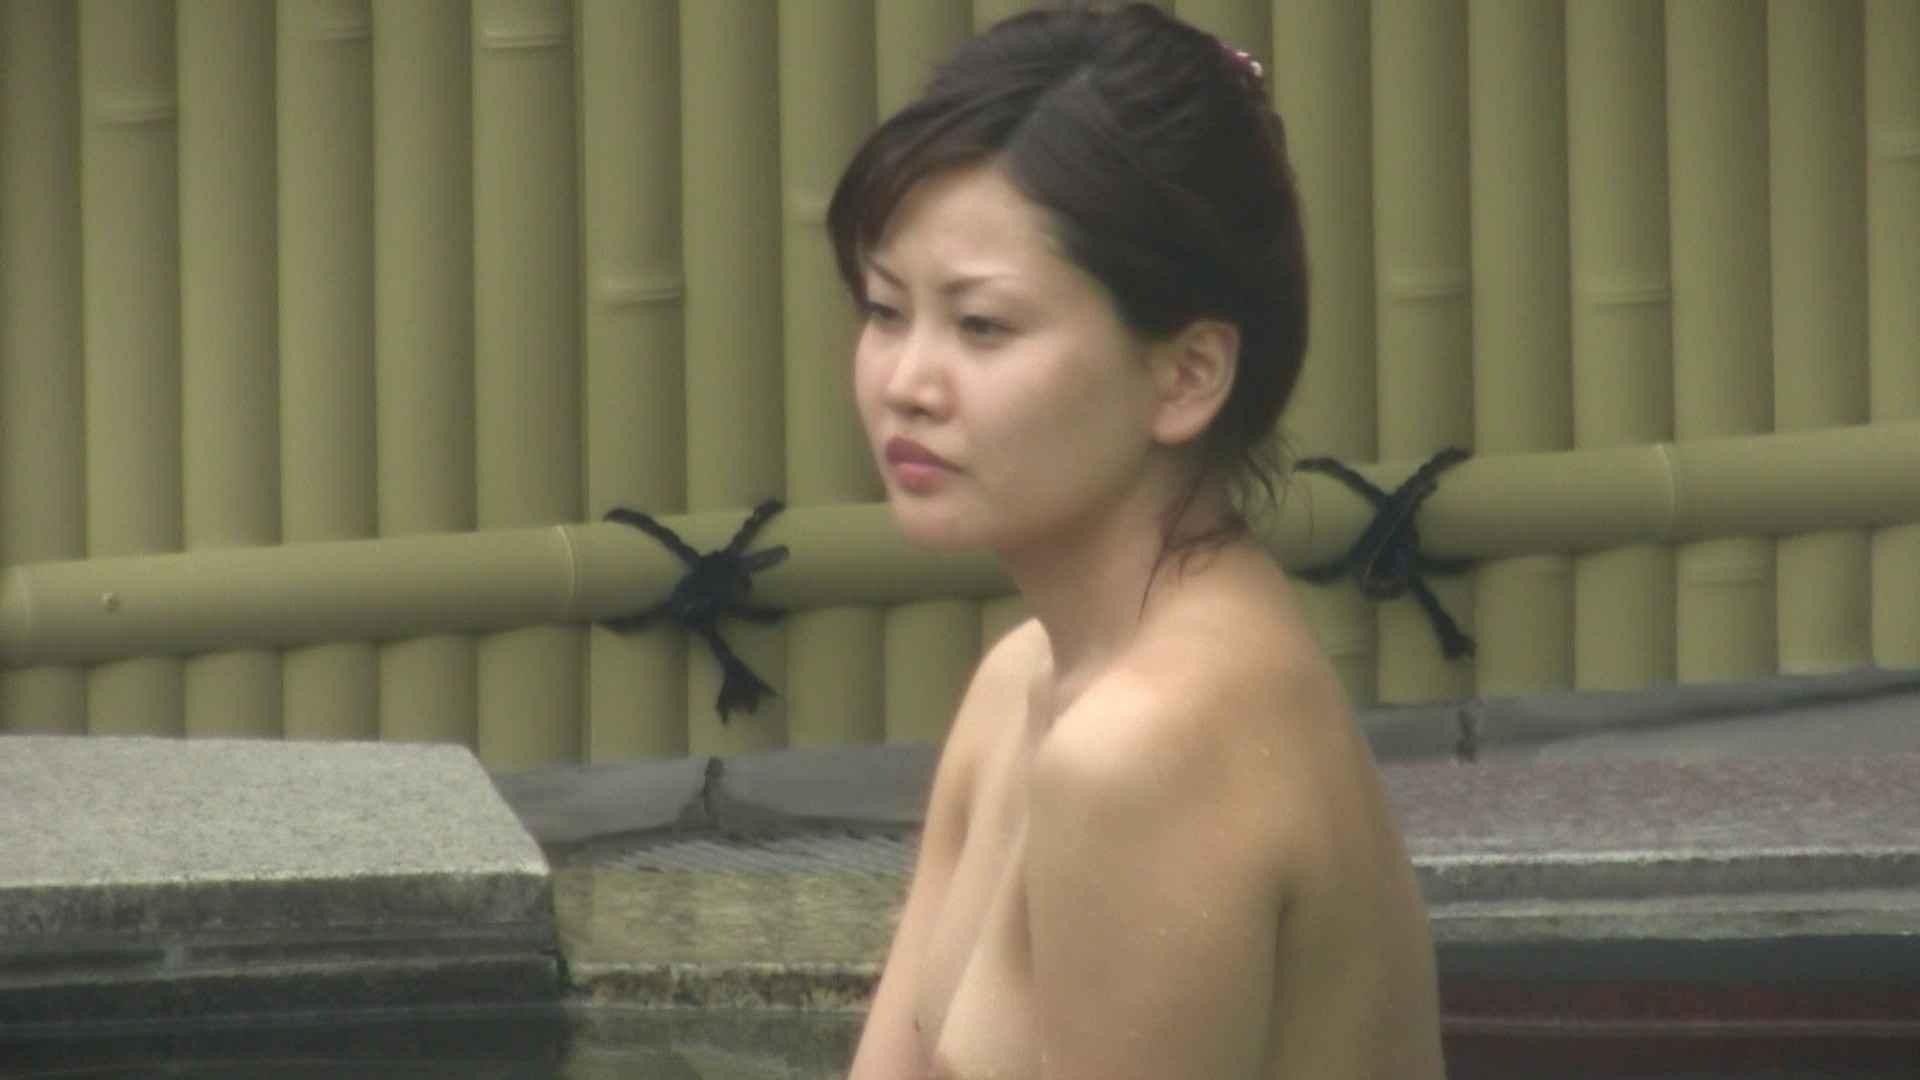 Aquaな露天風呂Vol.125 露天  88連発 38